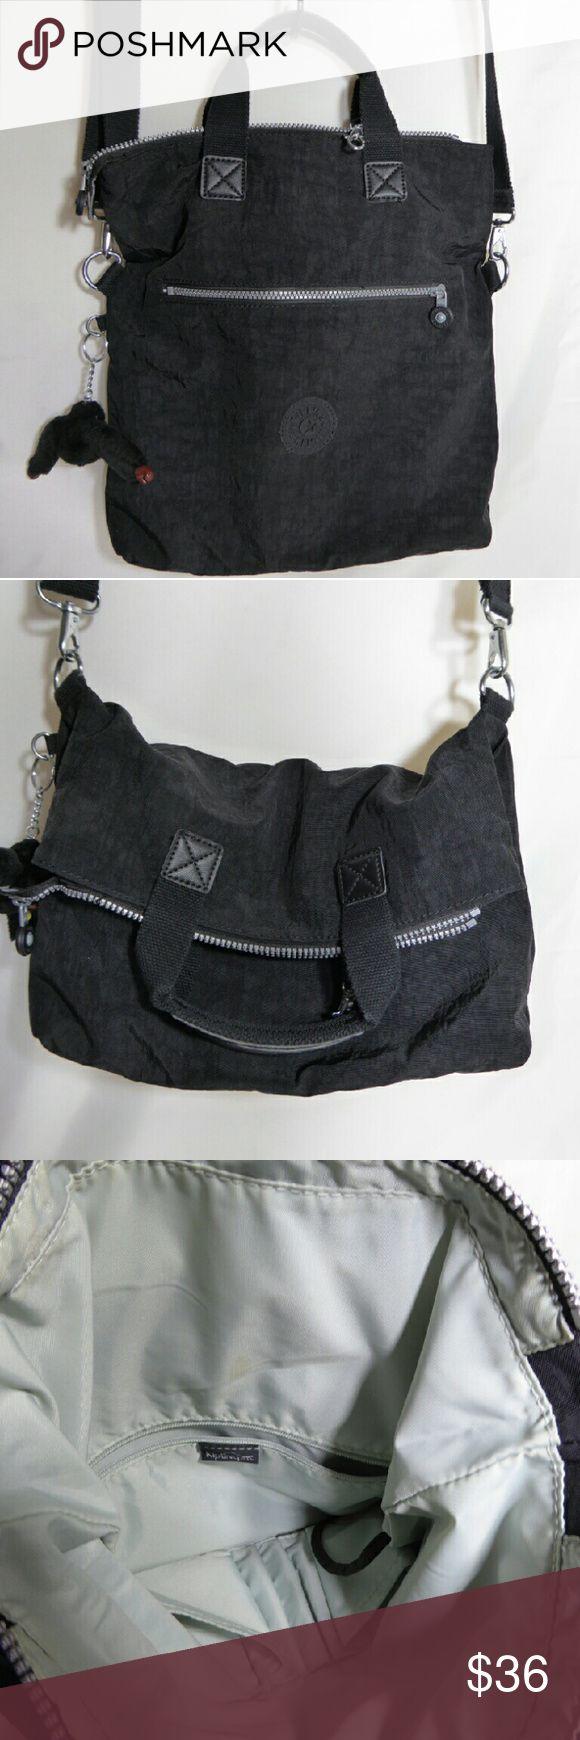 25 best ideas about kipling backpack on pinterest school handbags - Kipling Breiza Premium Foldover Shoulder Crossbody This Unusual Black Breiza Premium Bag From Kipling Has A Zip Fastening Along Top Pair Of Fixed Handles